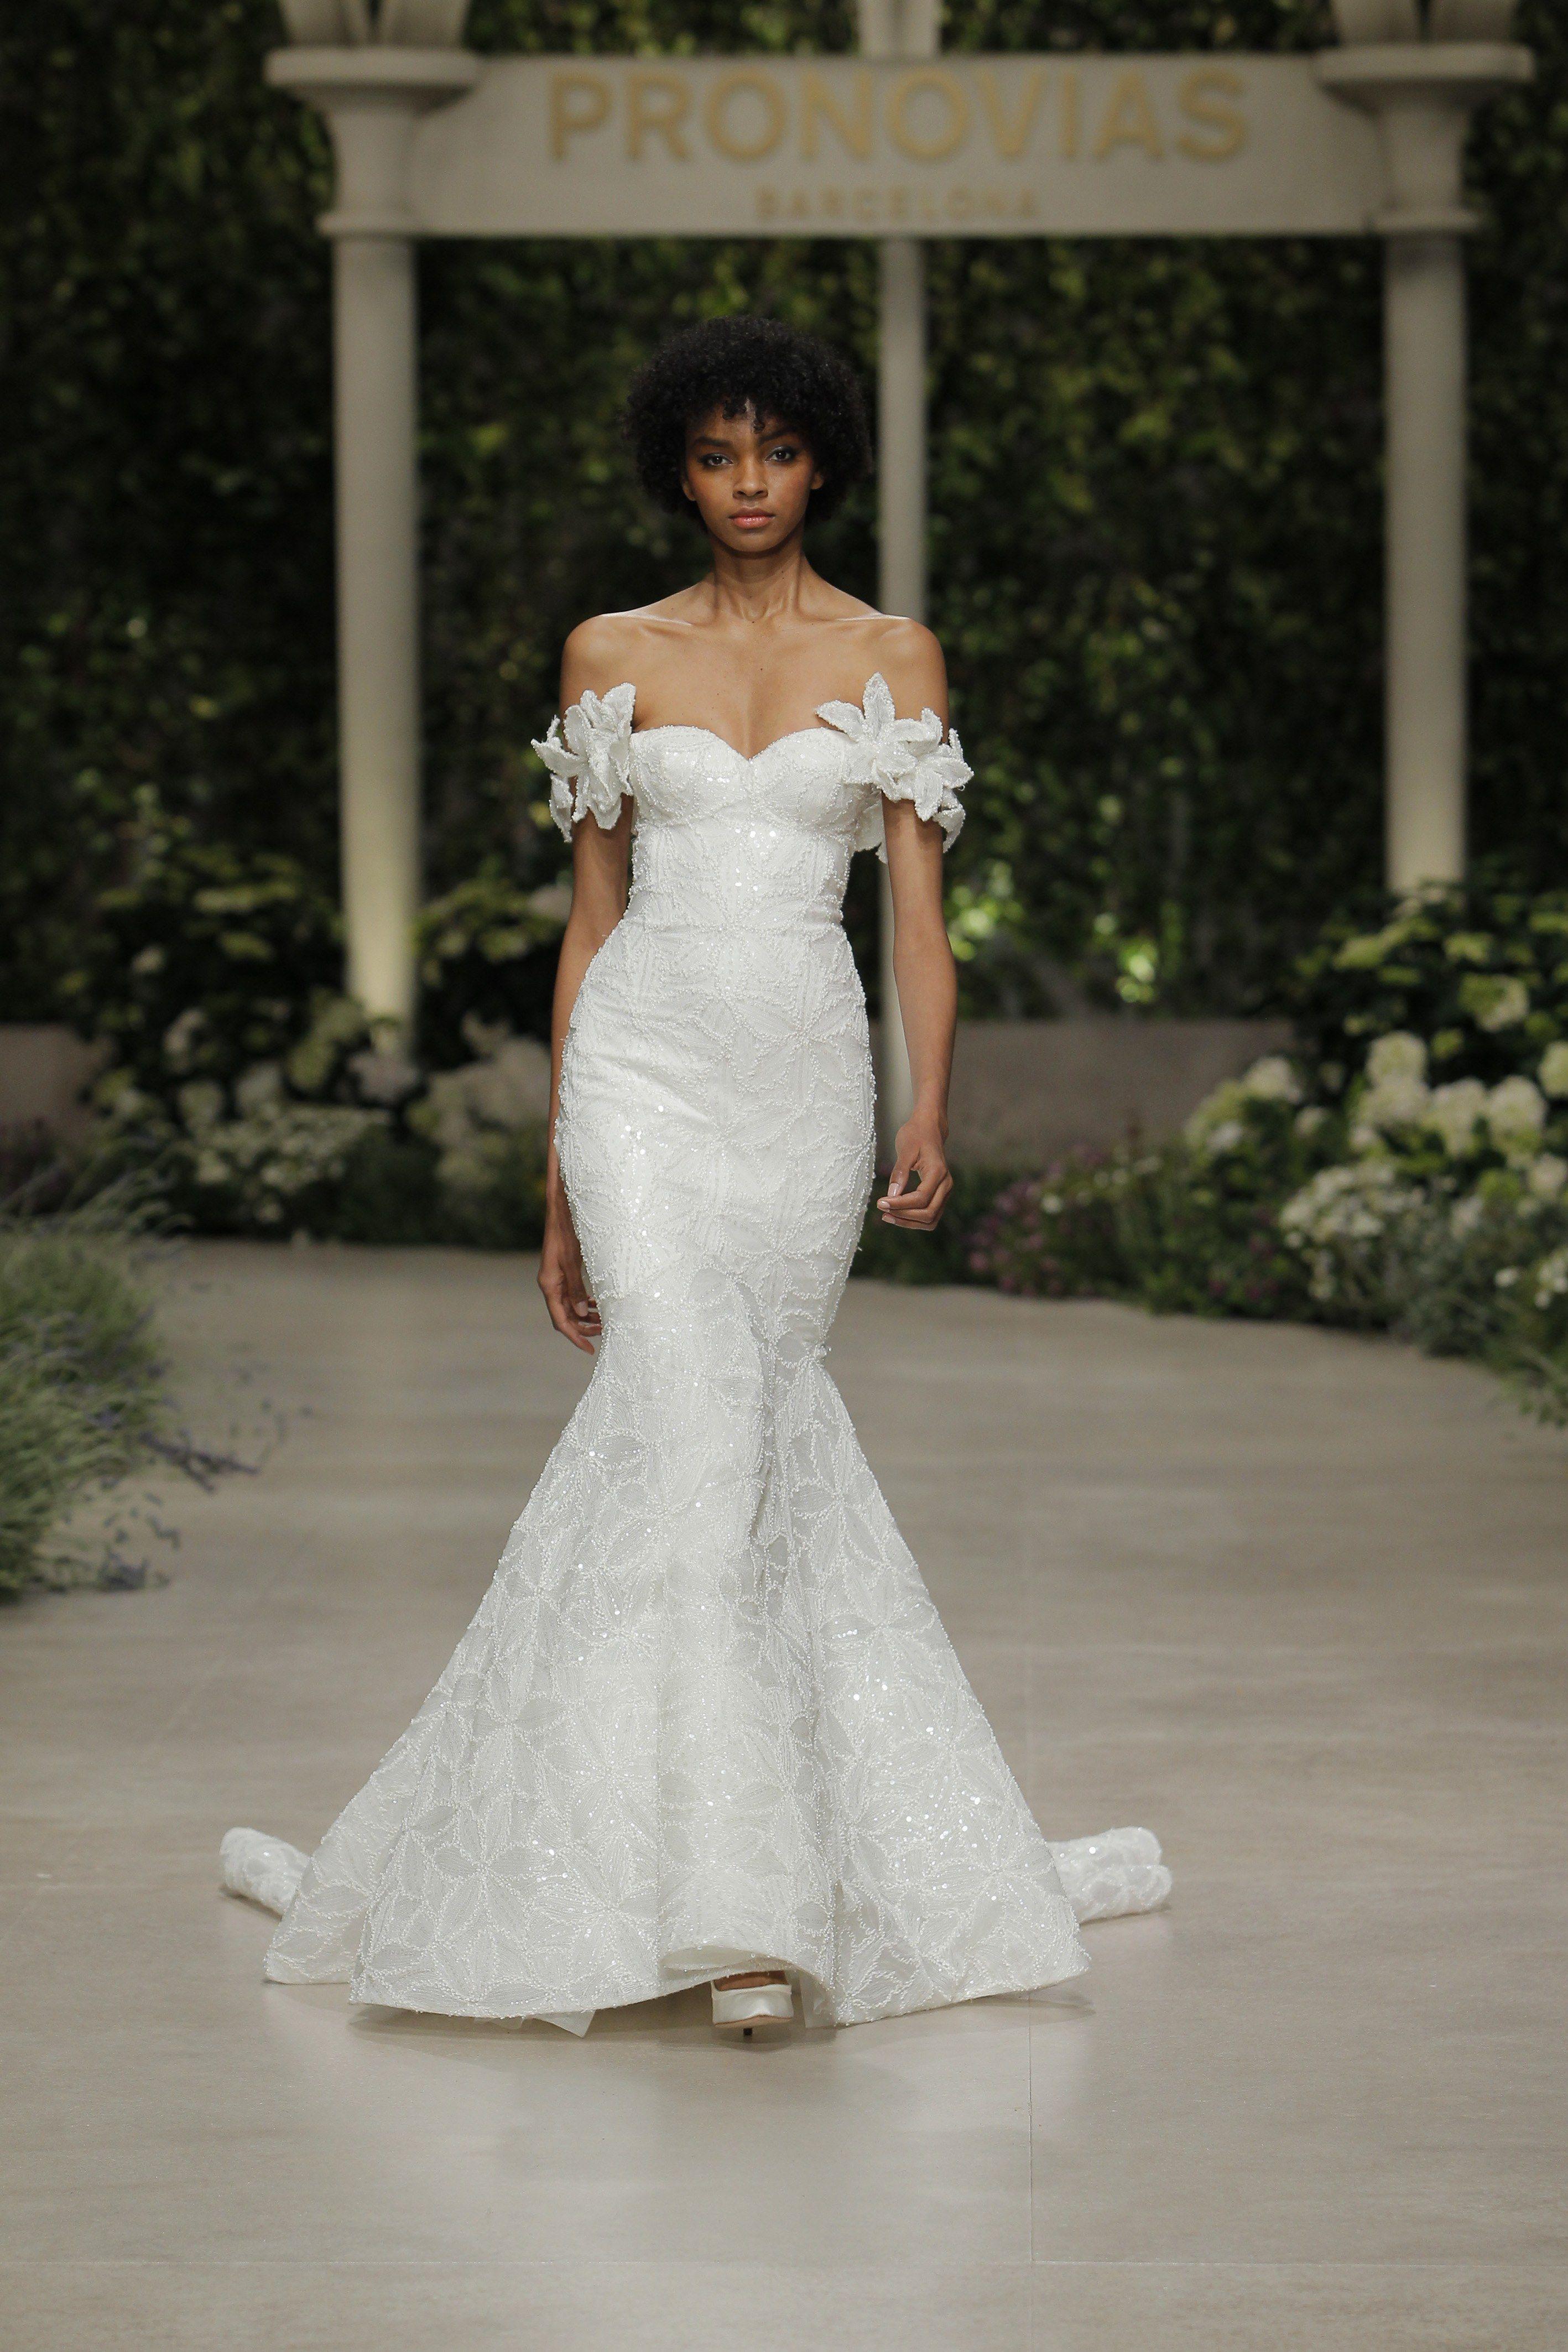 Pronovias Spring 2019 Bridal Collection Pronovias Spring 2019 Bridal Collection new picture